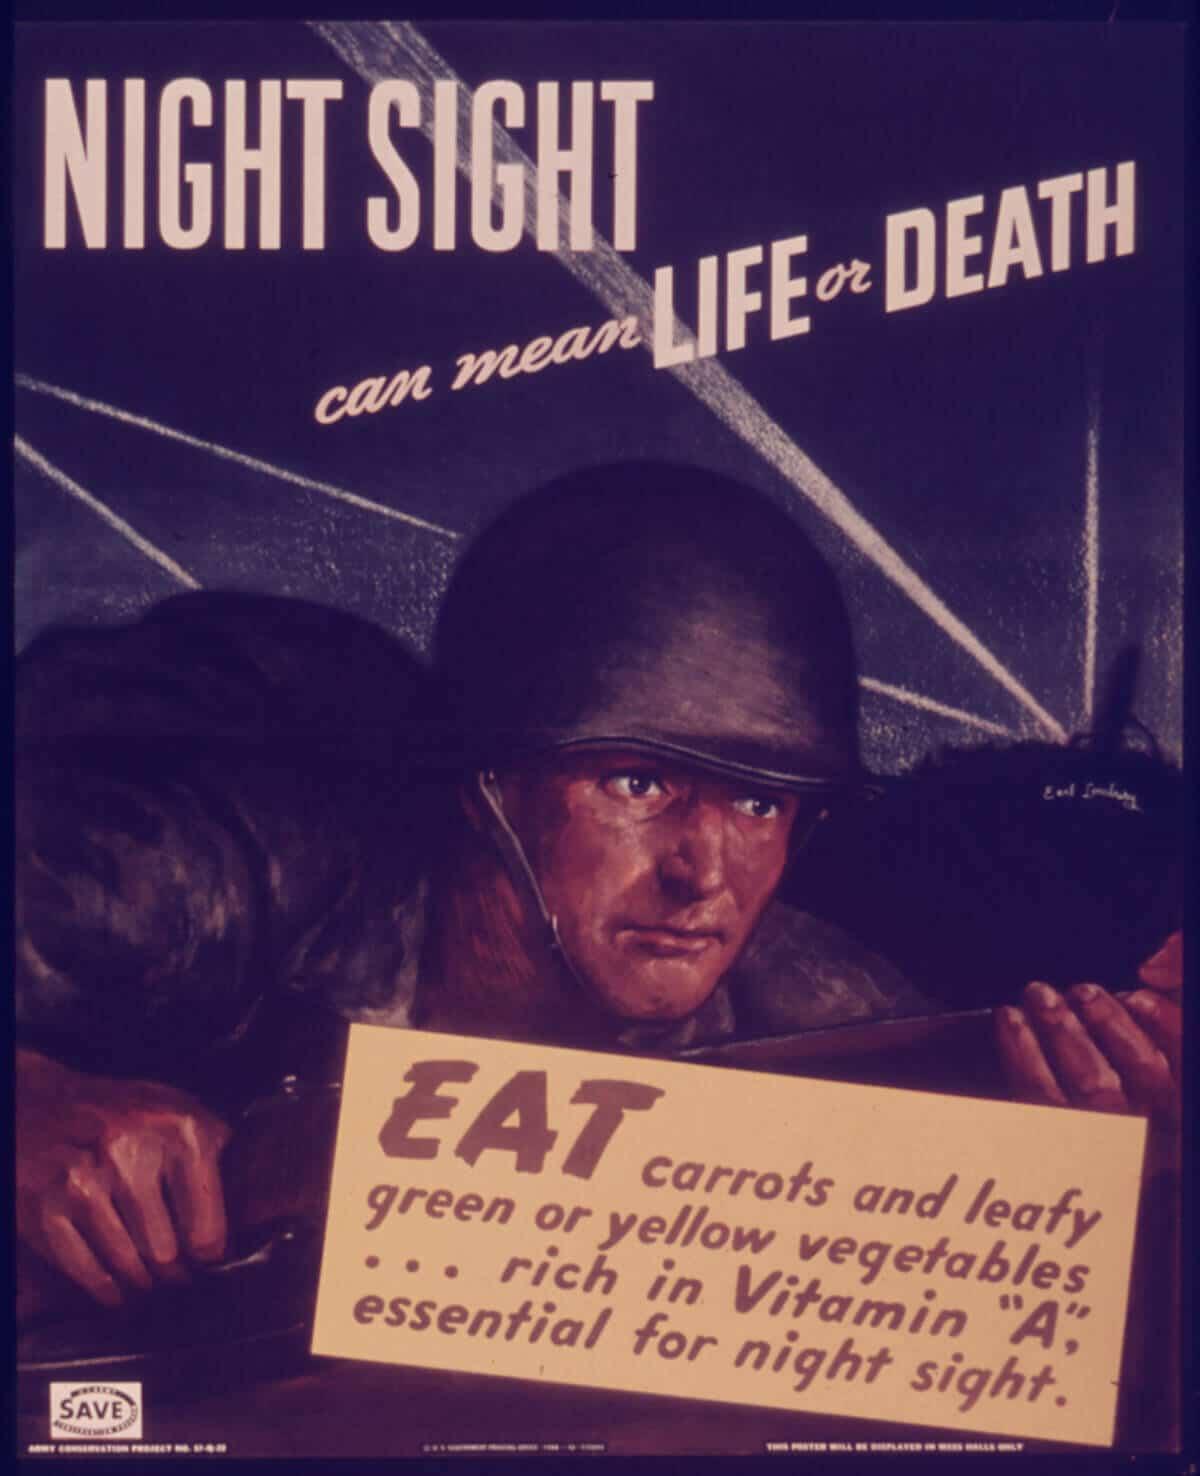 World War II British propaganda claimed carrots improve eyesight